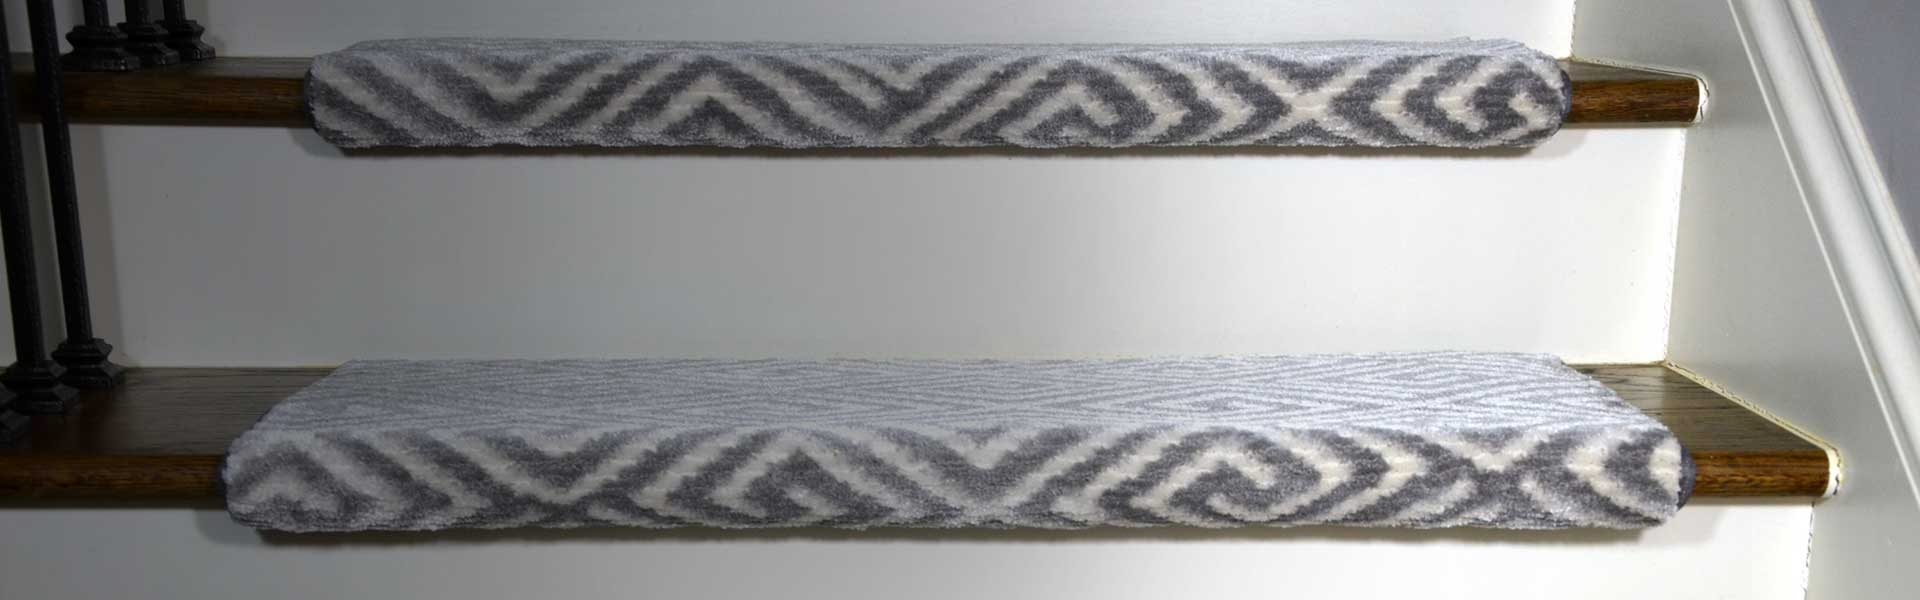 Carpet Stair Treads Runner Rugs – Dean Flooring Company | 36 Inch Carpet Stair Treads | Basement Stairs | Slip Resistant | Coffee Brown | Diamond Trellis | Bullnose Carpet